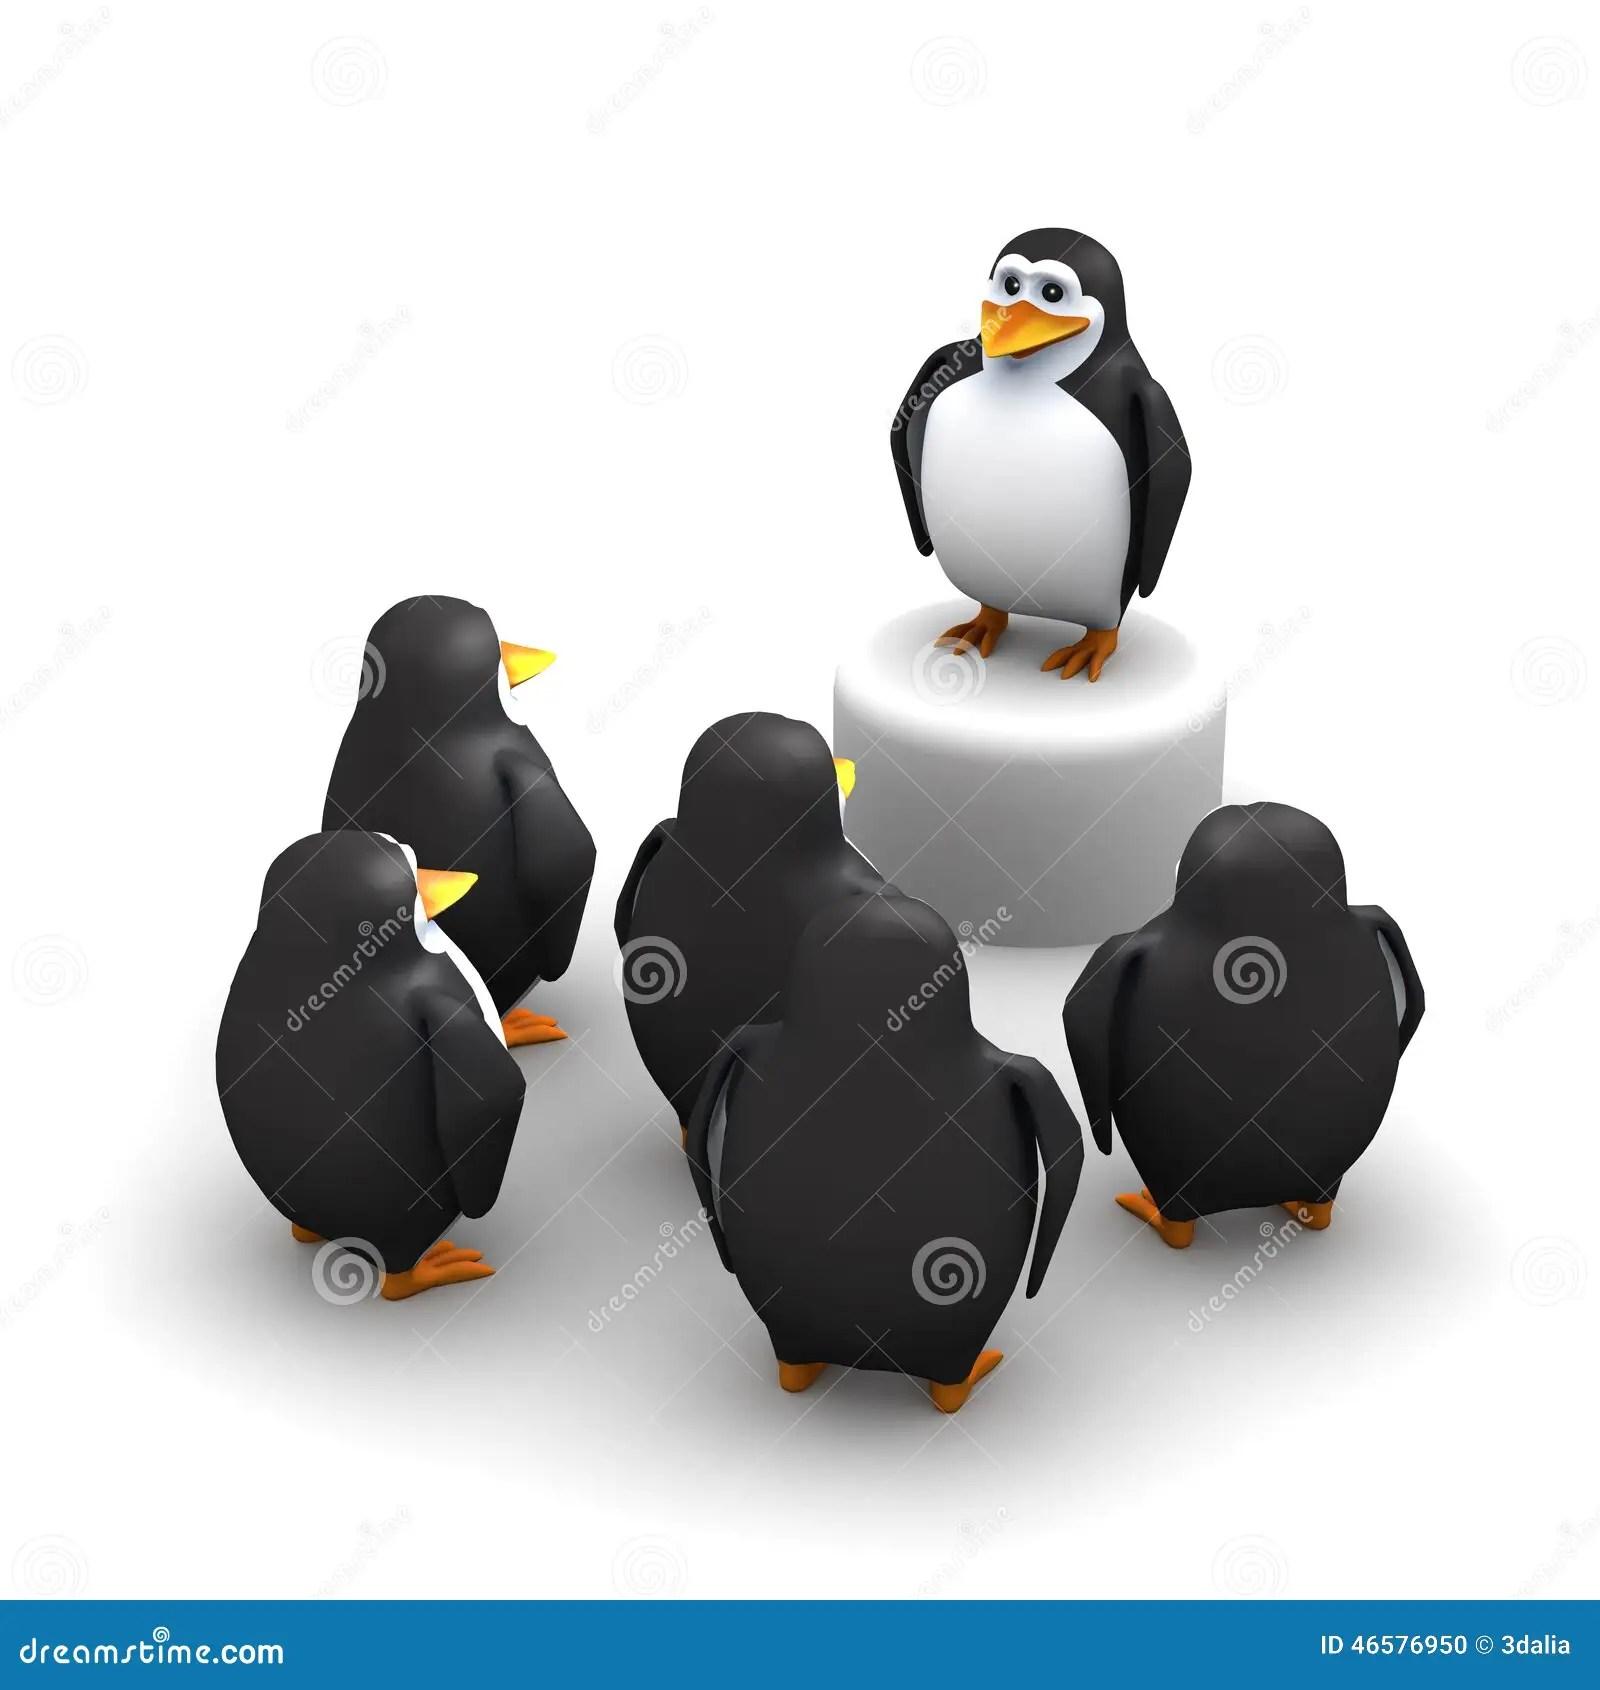 Cute Cartoon Penguins Wallpaper 3d Penguins Listen To Their Leader Stock Illustration